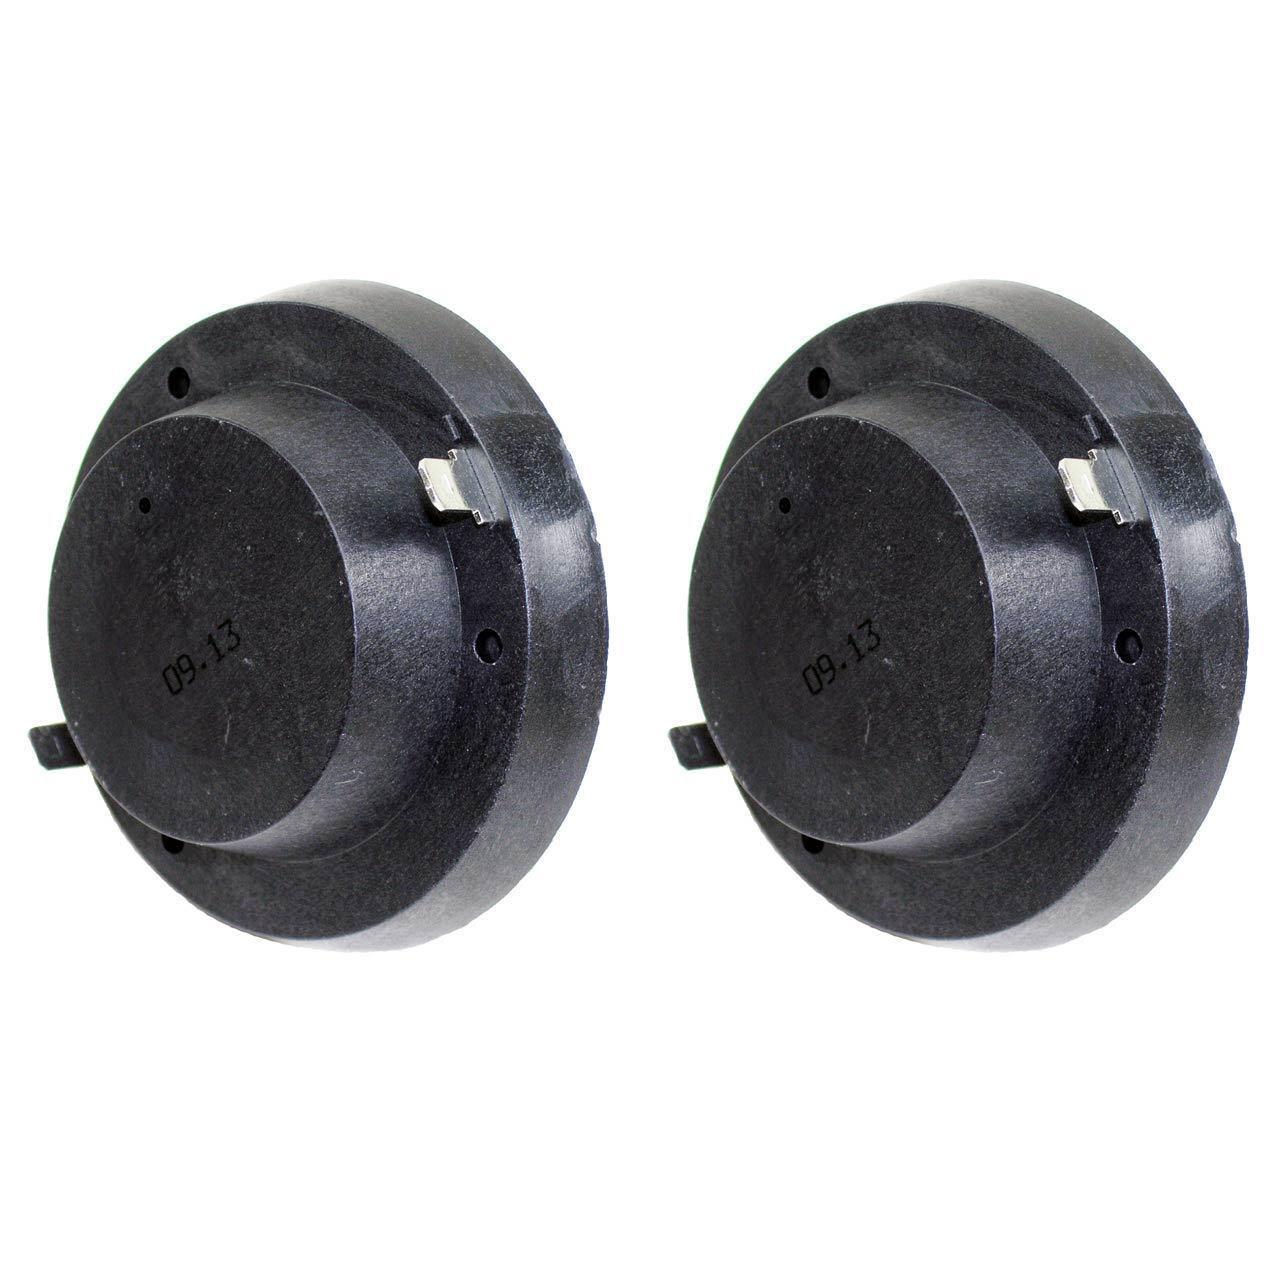 SS Audio Diaphragm For JBL 2416H, 2416H-1, D-2416-2 (2 PACK)